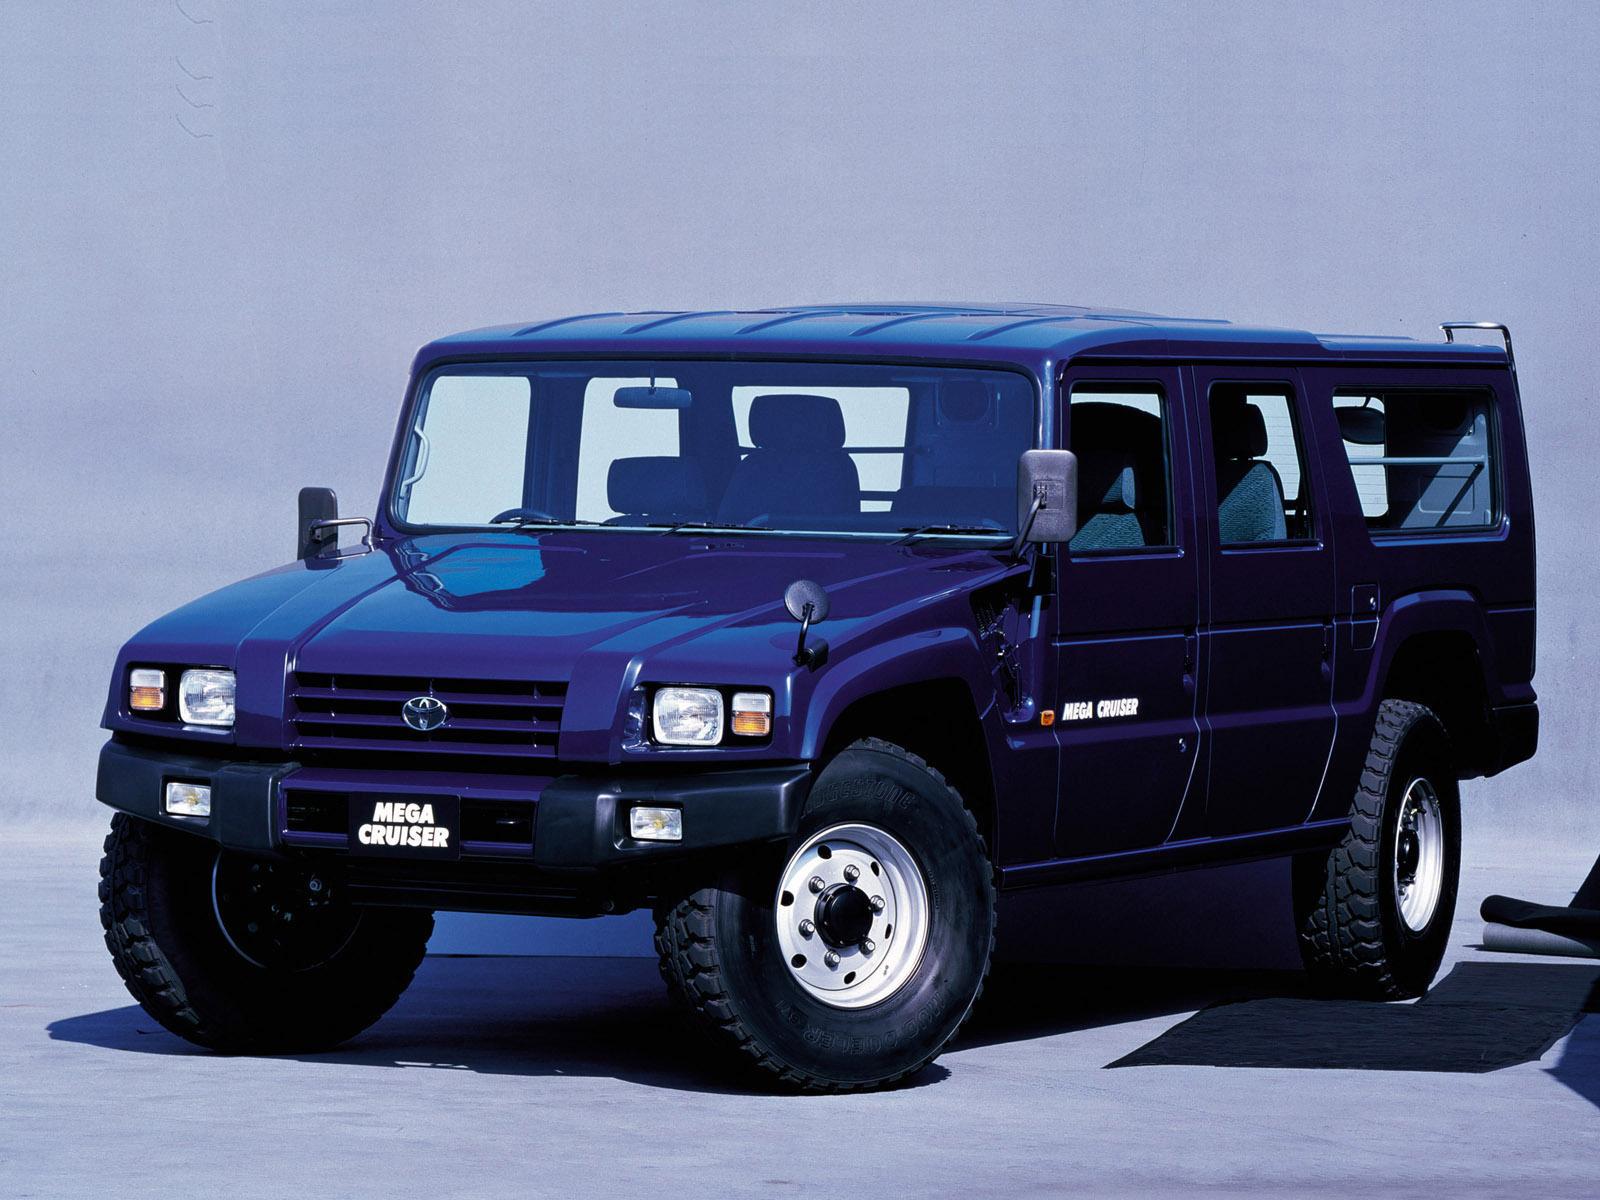 Technically Jurisprudence Diesel SUV s The Toyota Mega Cruiser